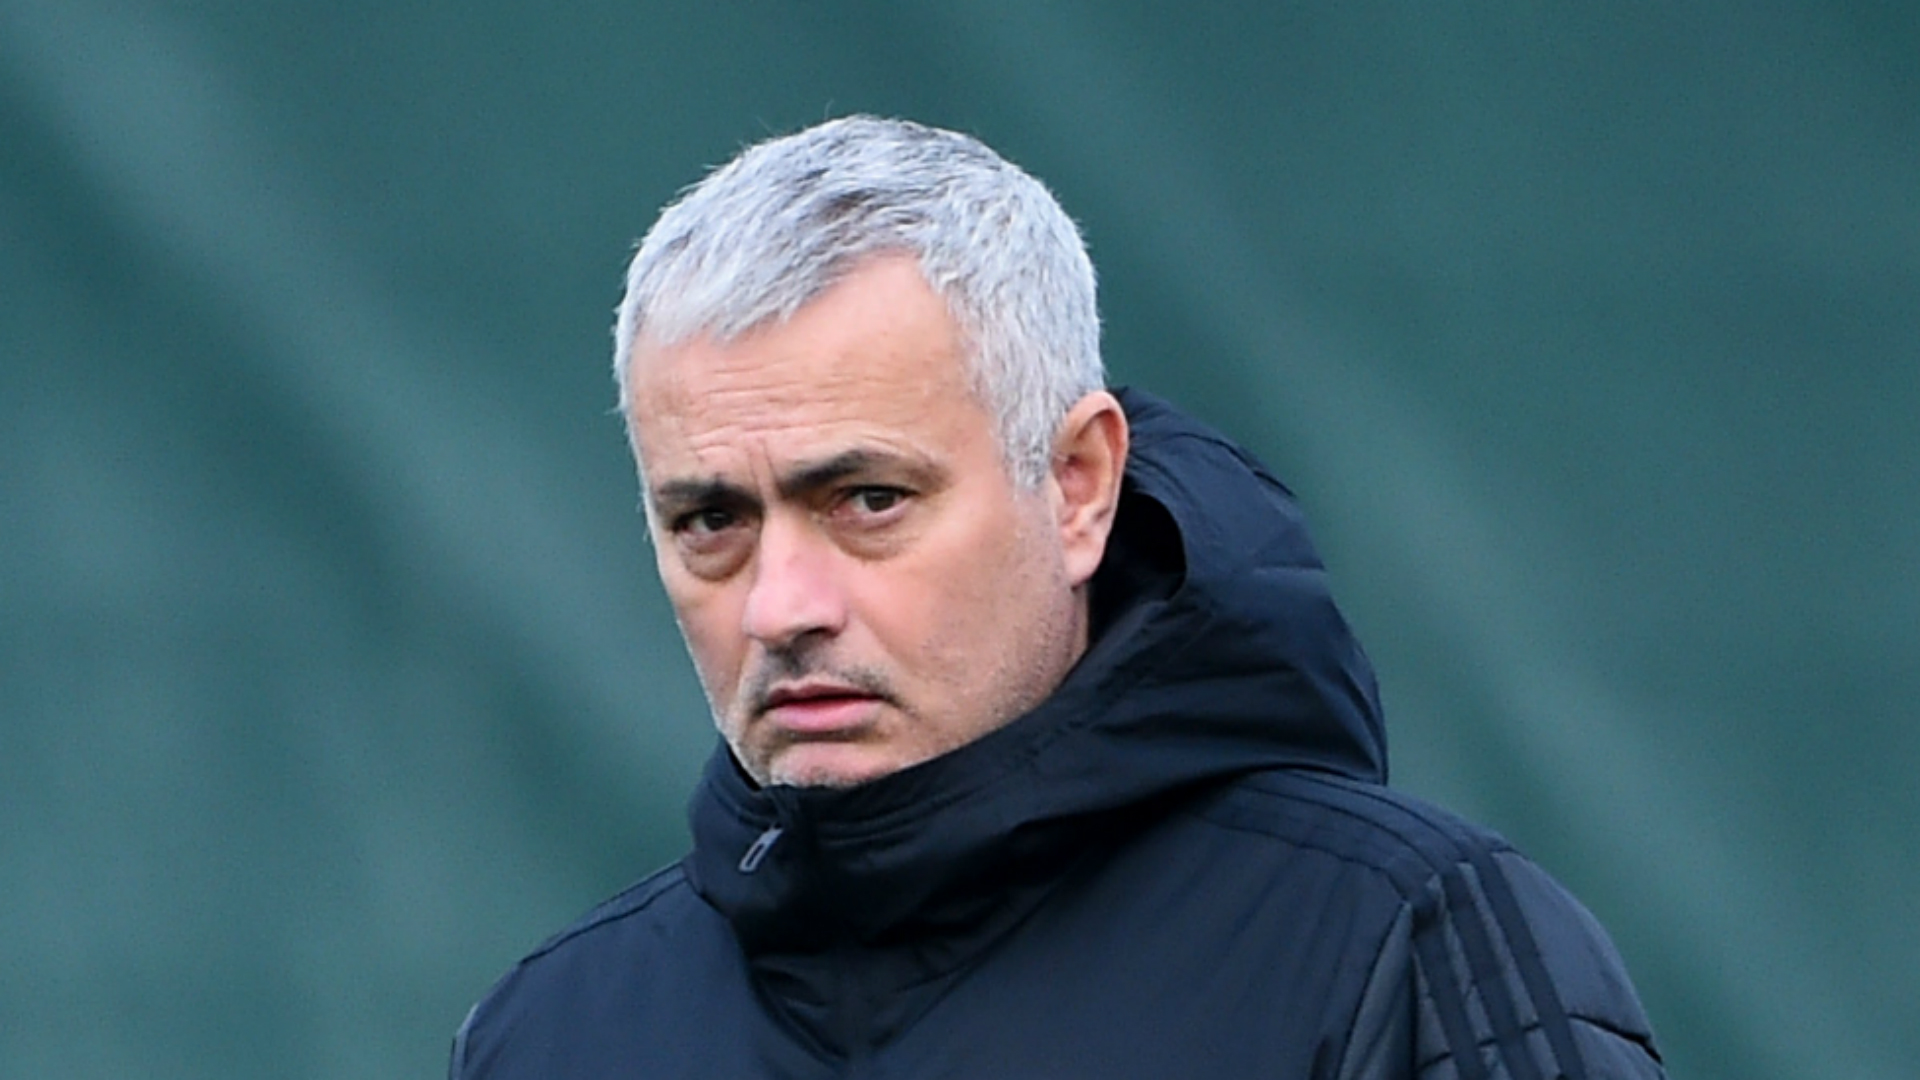 Mourinho eyes national team job